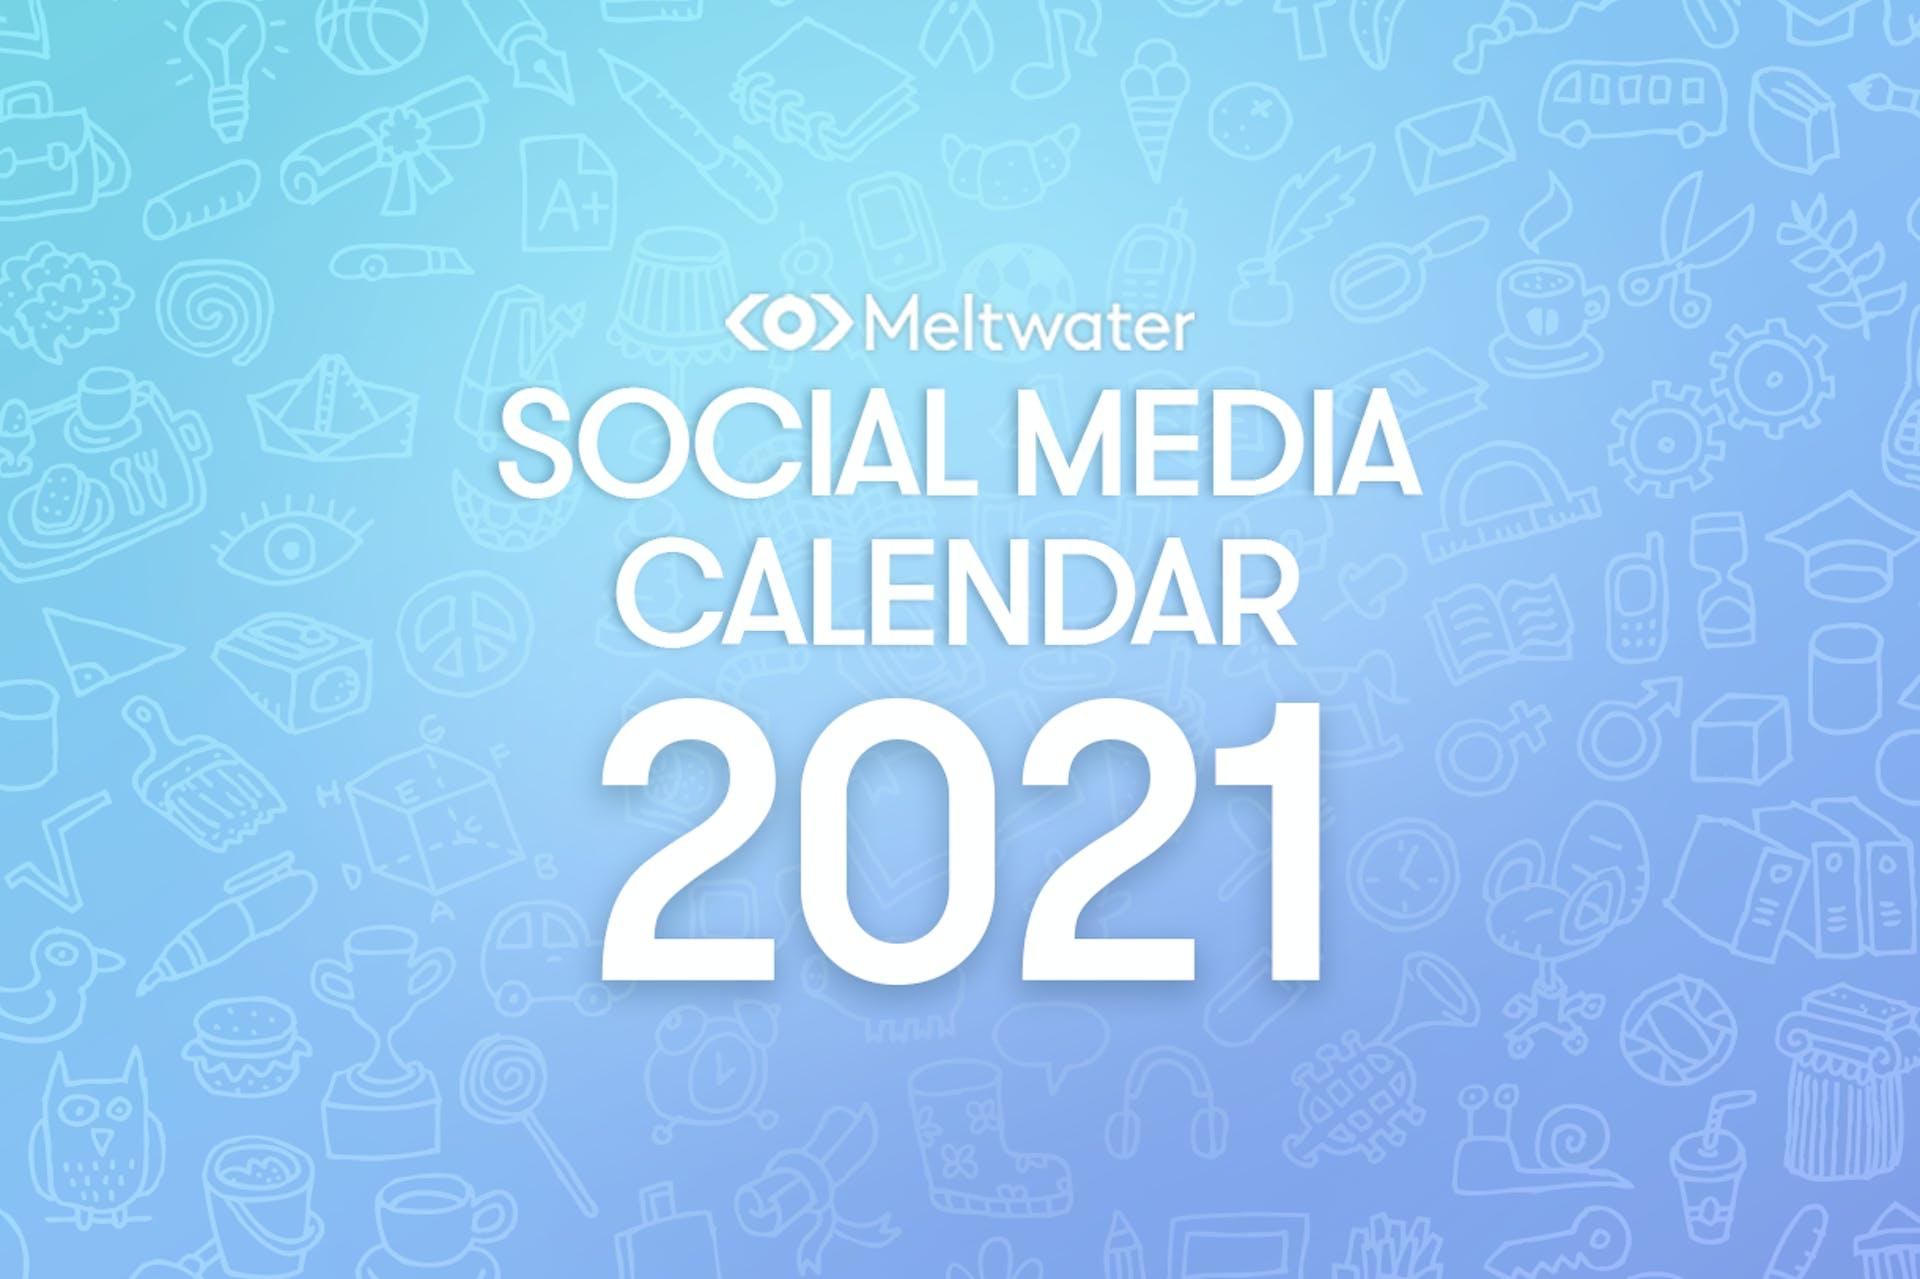 Social Media calendar for 2021